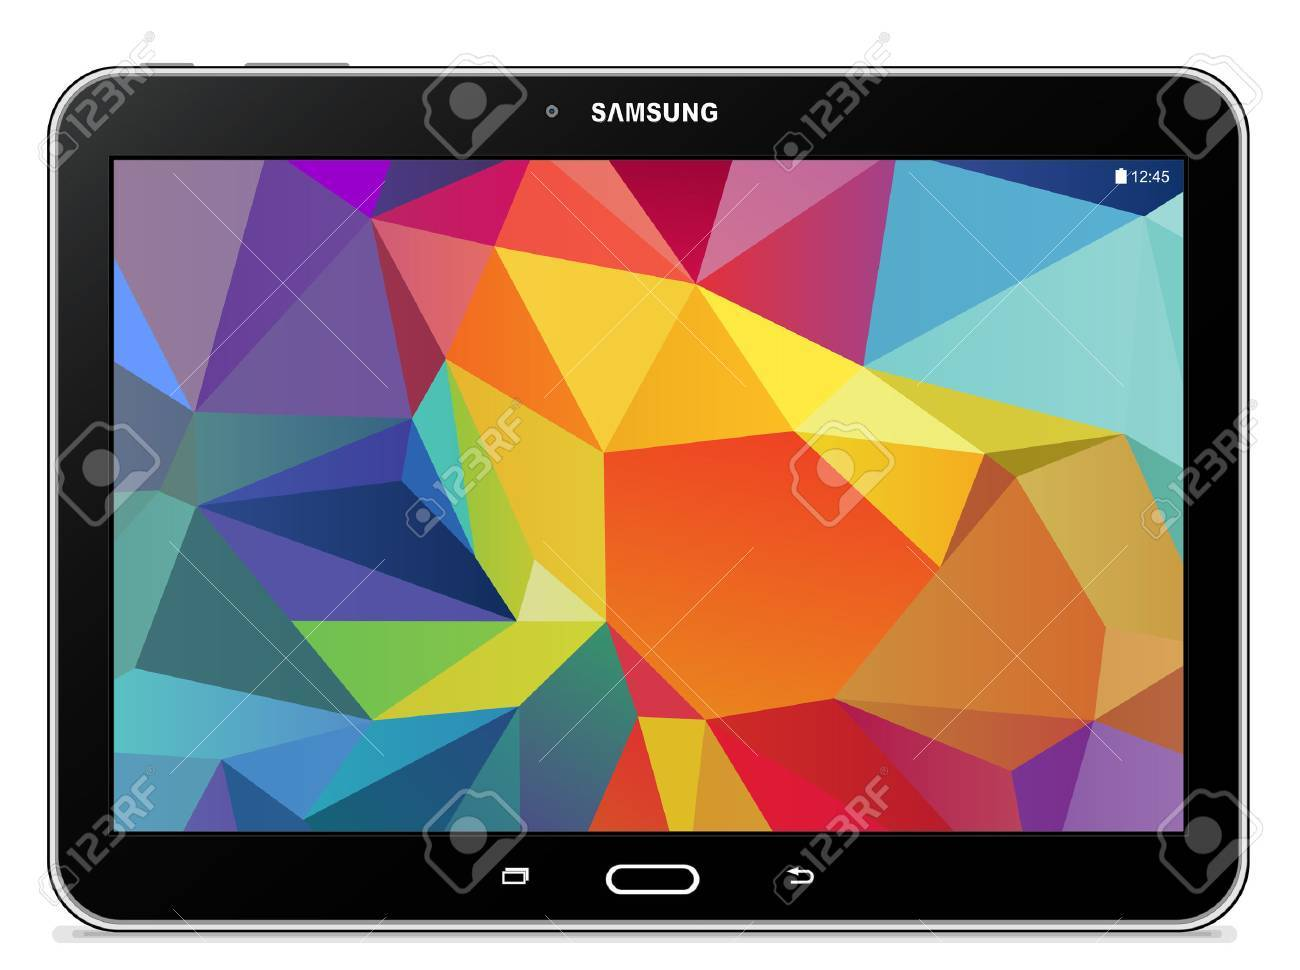 Samsung Galaxy Tab 10.1 LTE 4 noir Banque d'images - 31143875